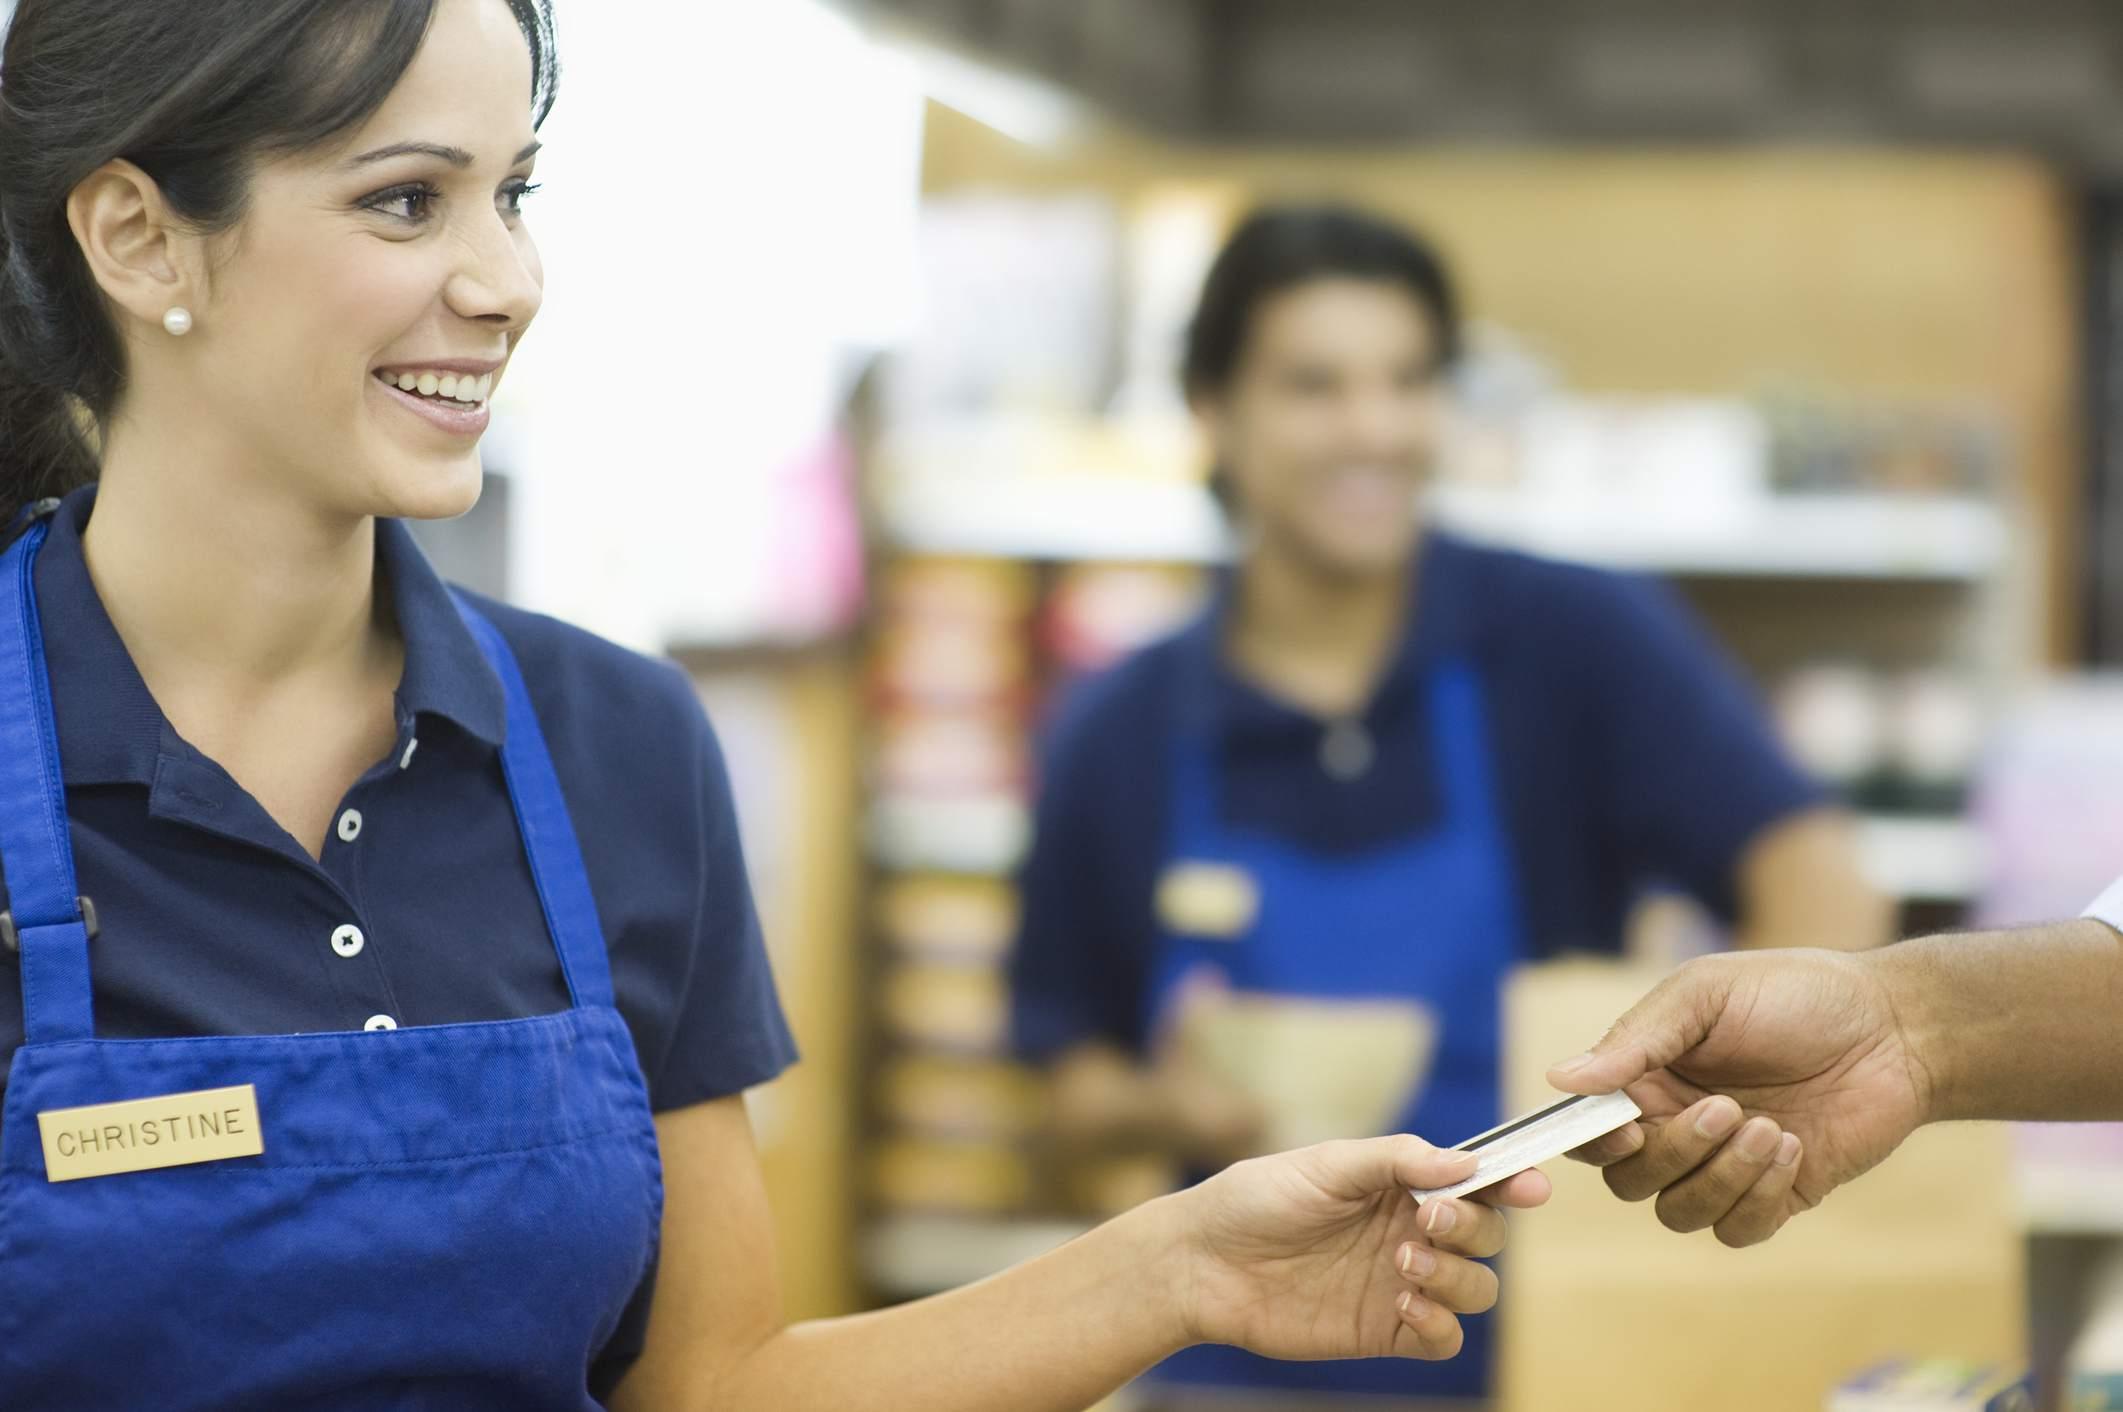 Customer handing cashier store loyalty card